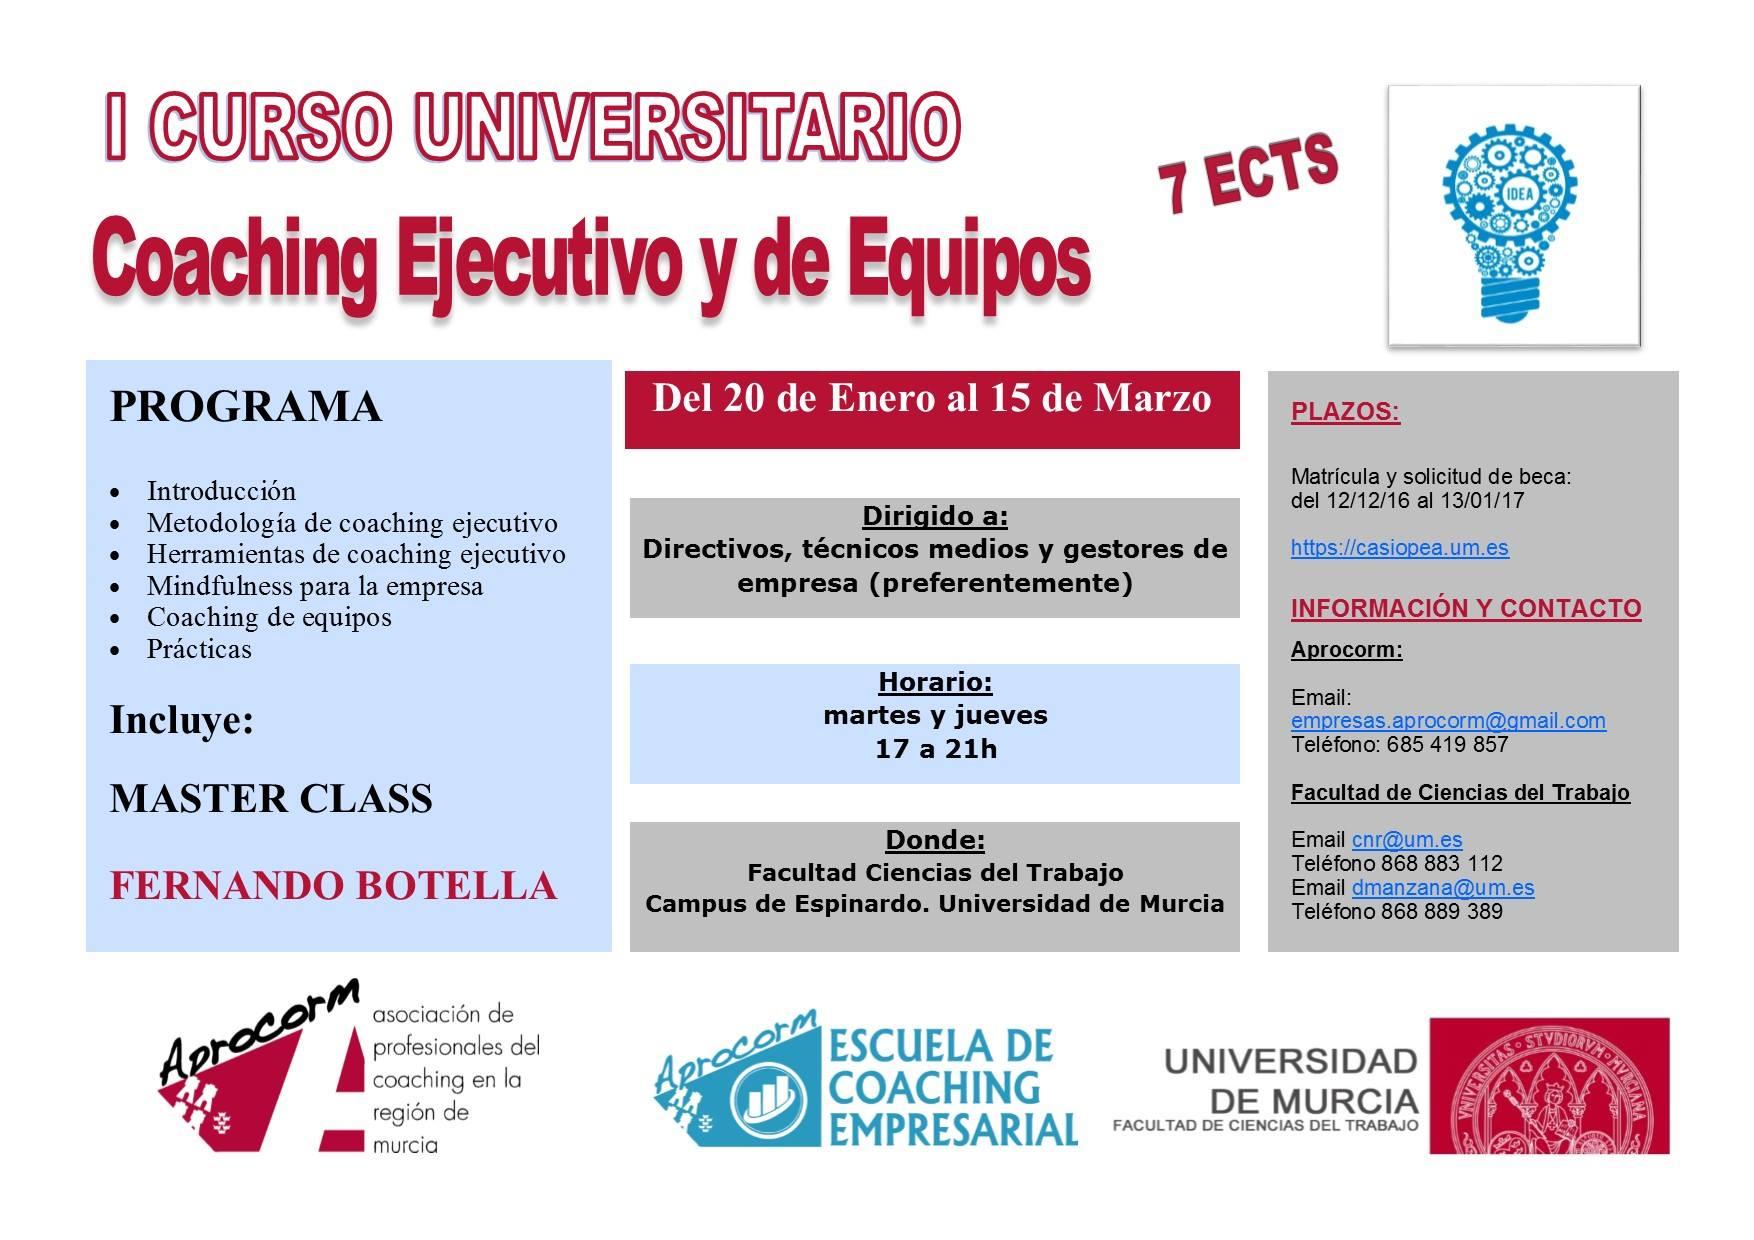 I Curso Universitario Coaching Ejecutivo